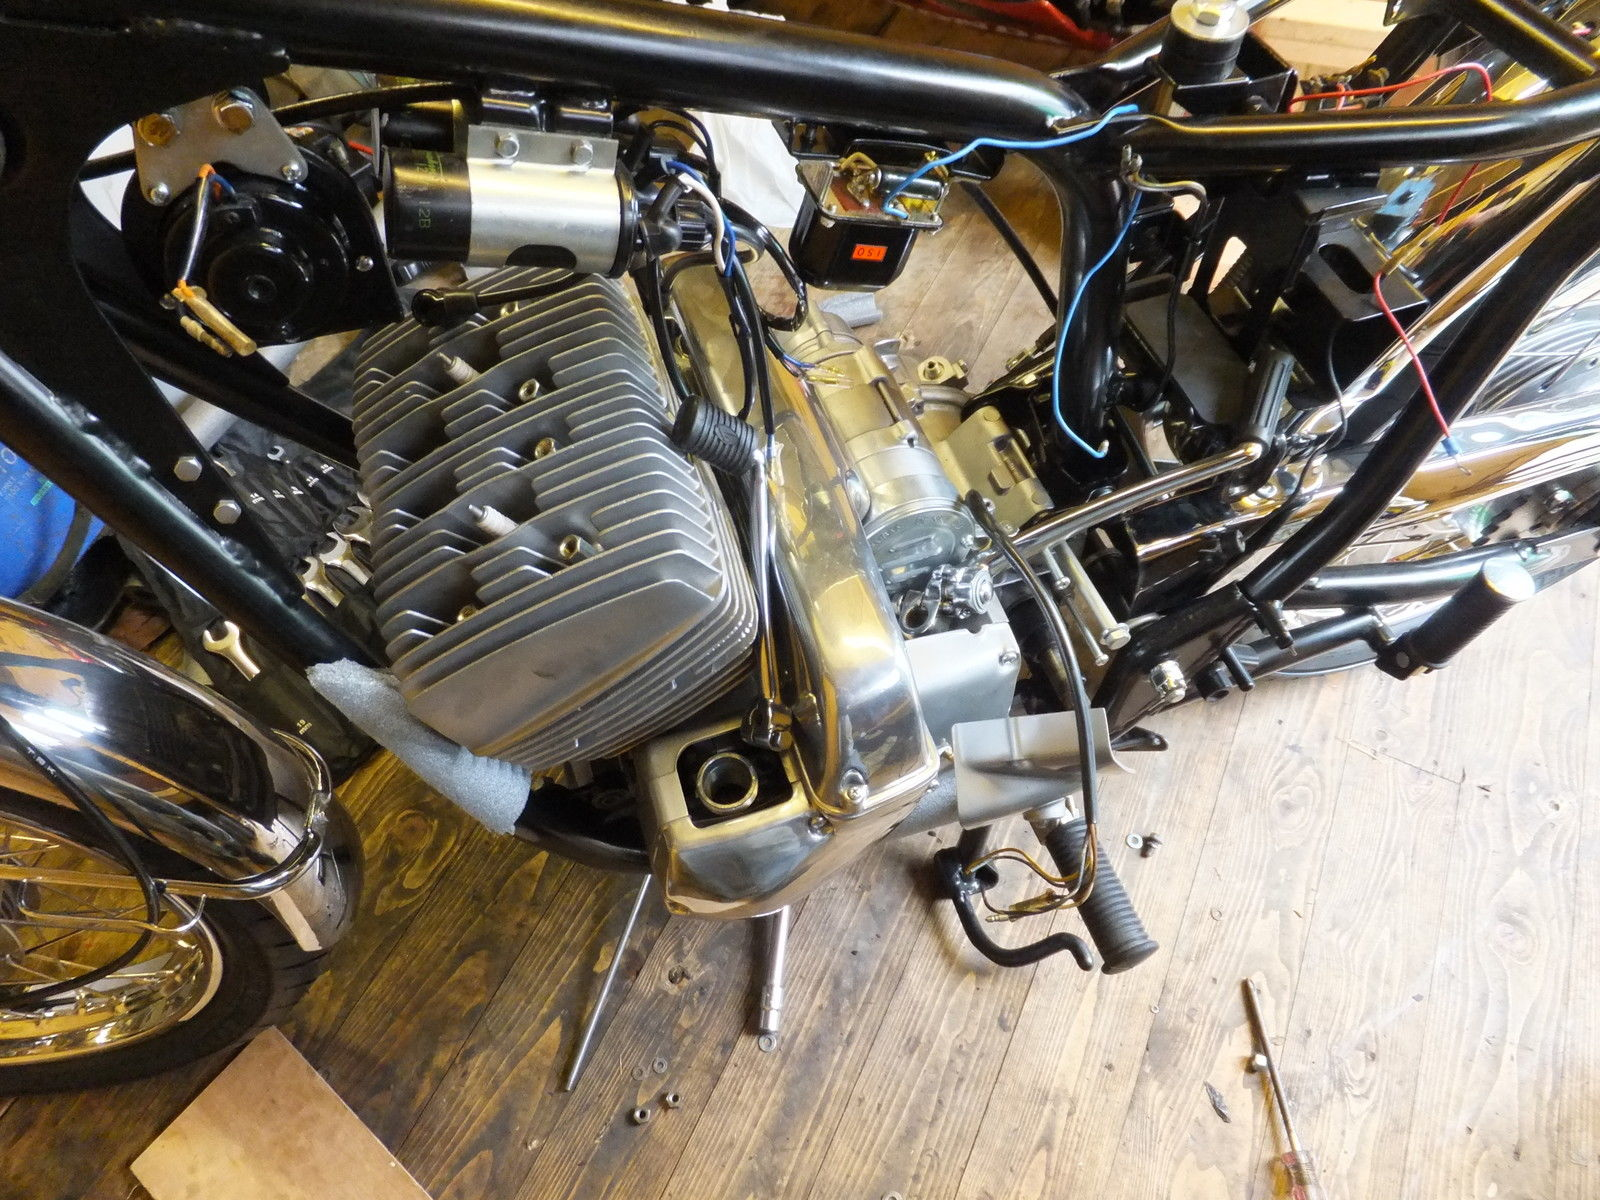 Bridgestone GTR350 - 1967